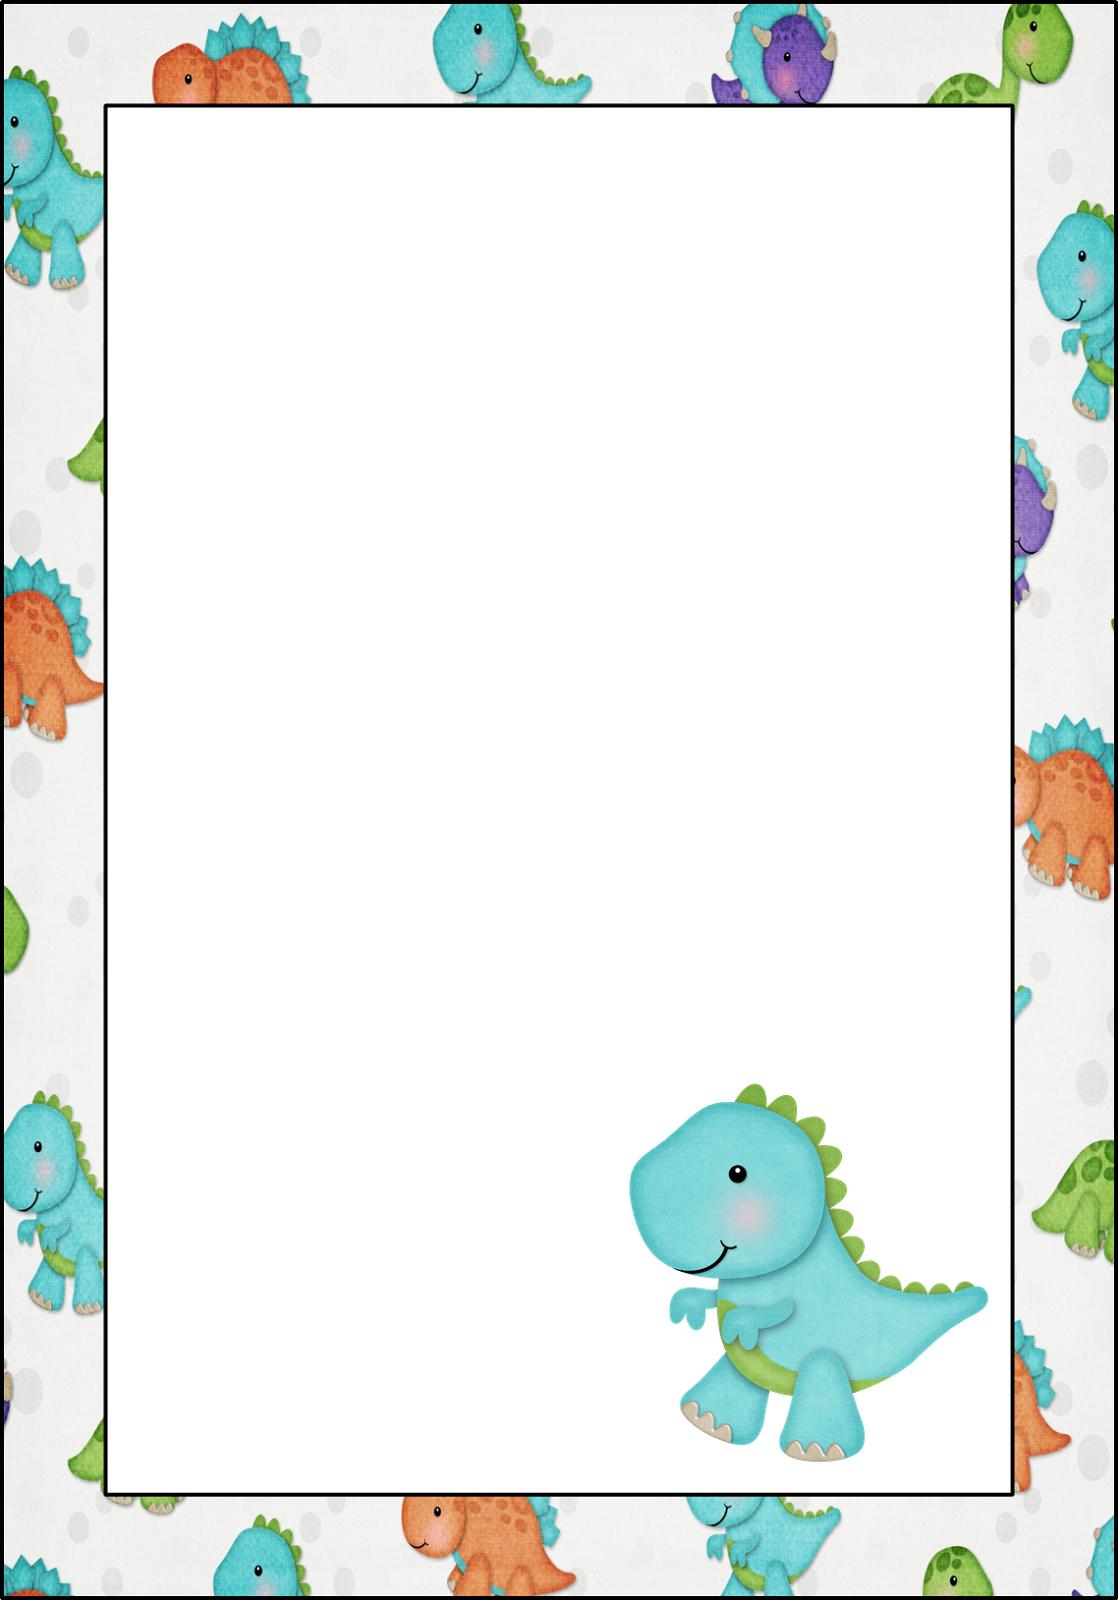 free-printable-frame-201.png (1118×1600) | Dinousours | Pinterest ...